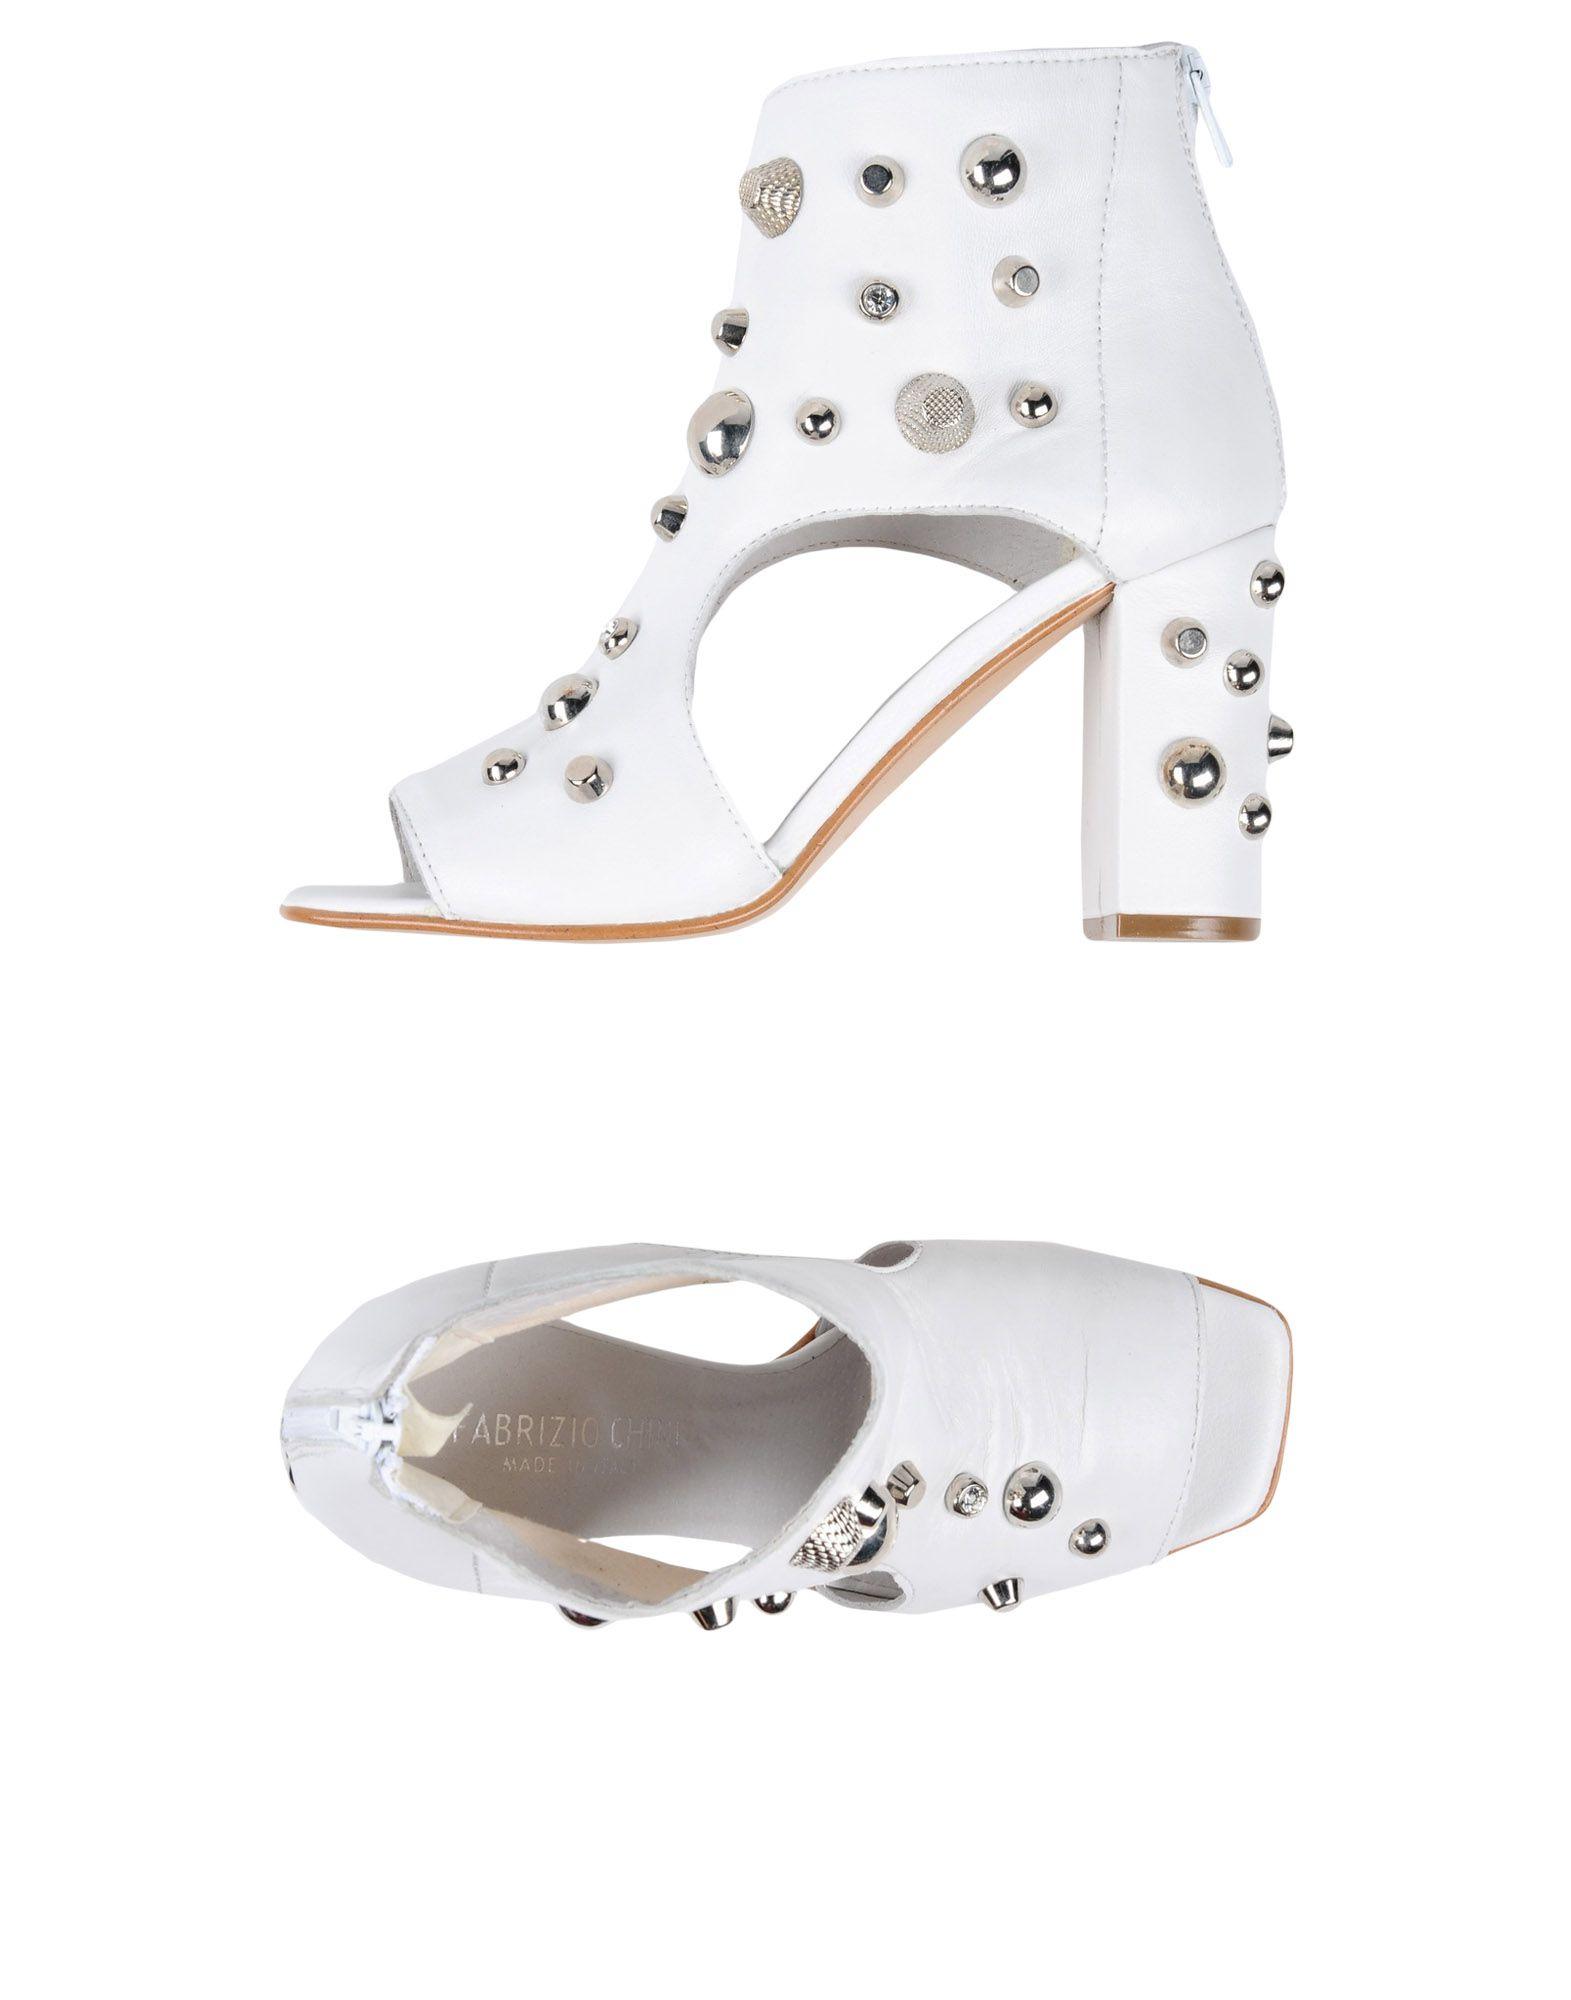 Fabrizio Chini Gute Stiefelette Damen  11434818QX Gute Chini Qualität beliebte Schuhe 64ce94